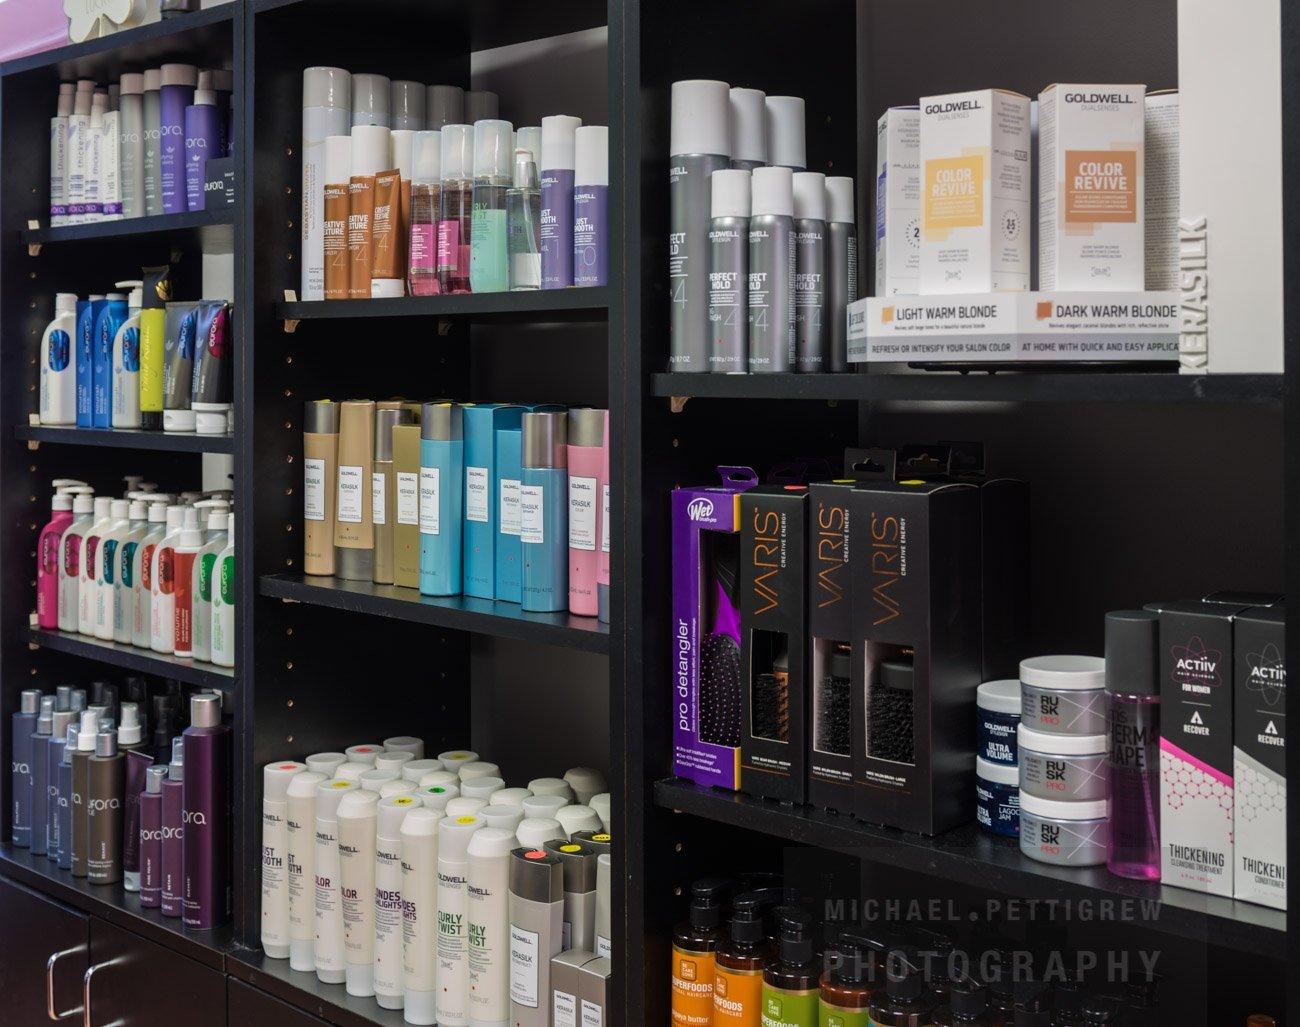 Hair Salon photography products in Falls Church, VA